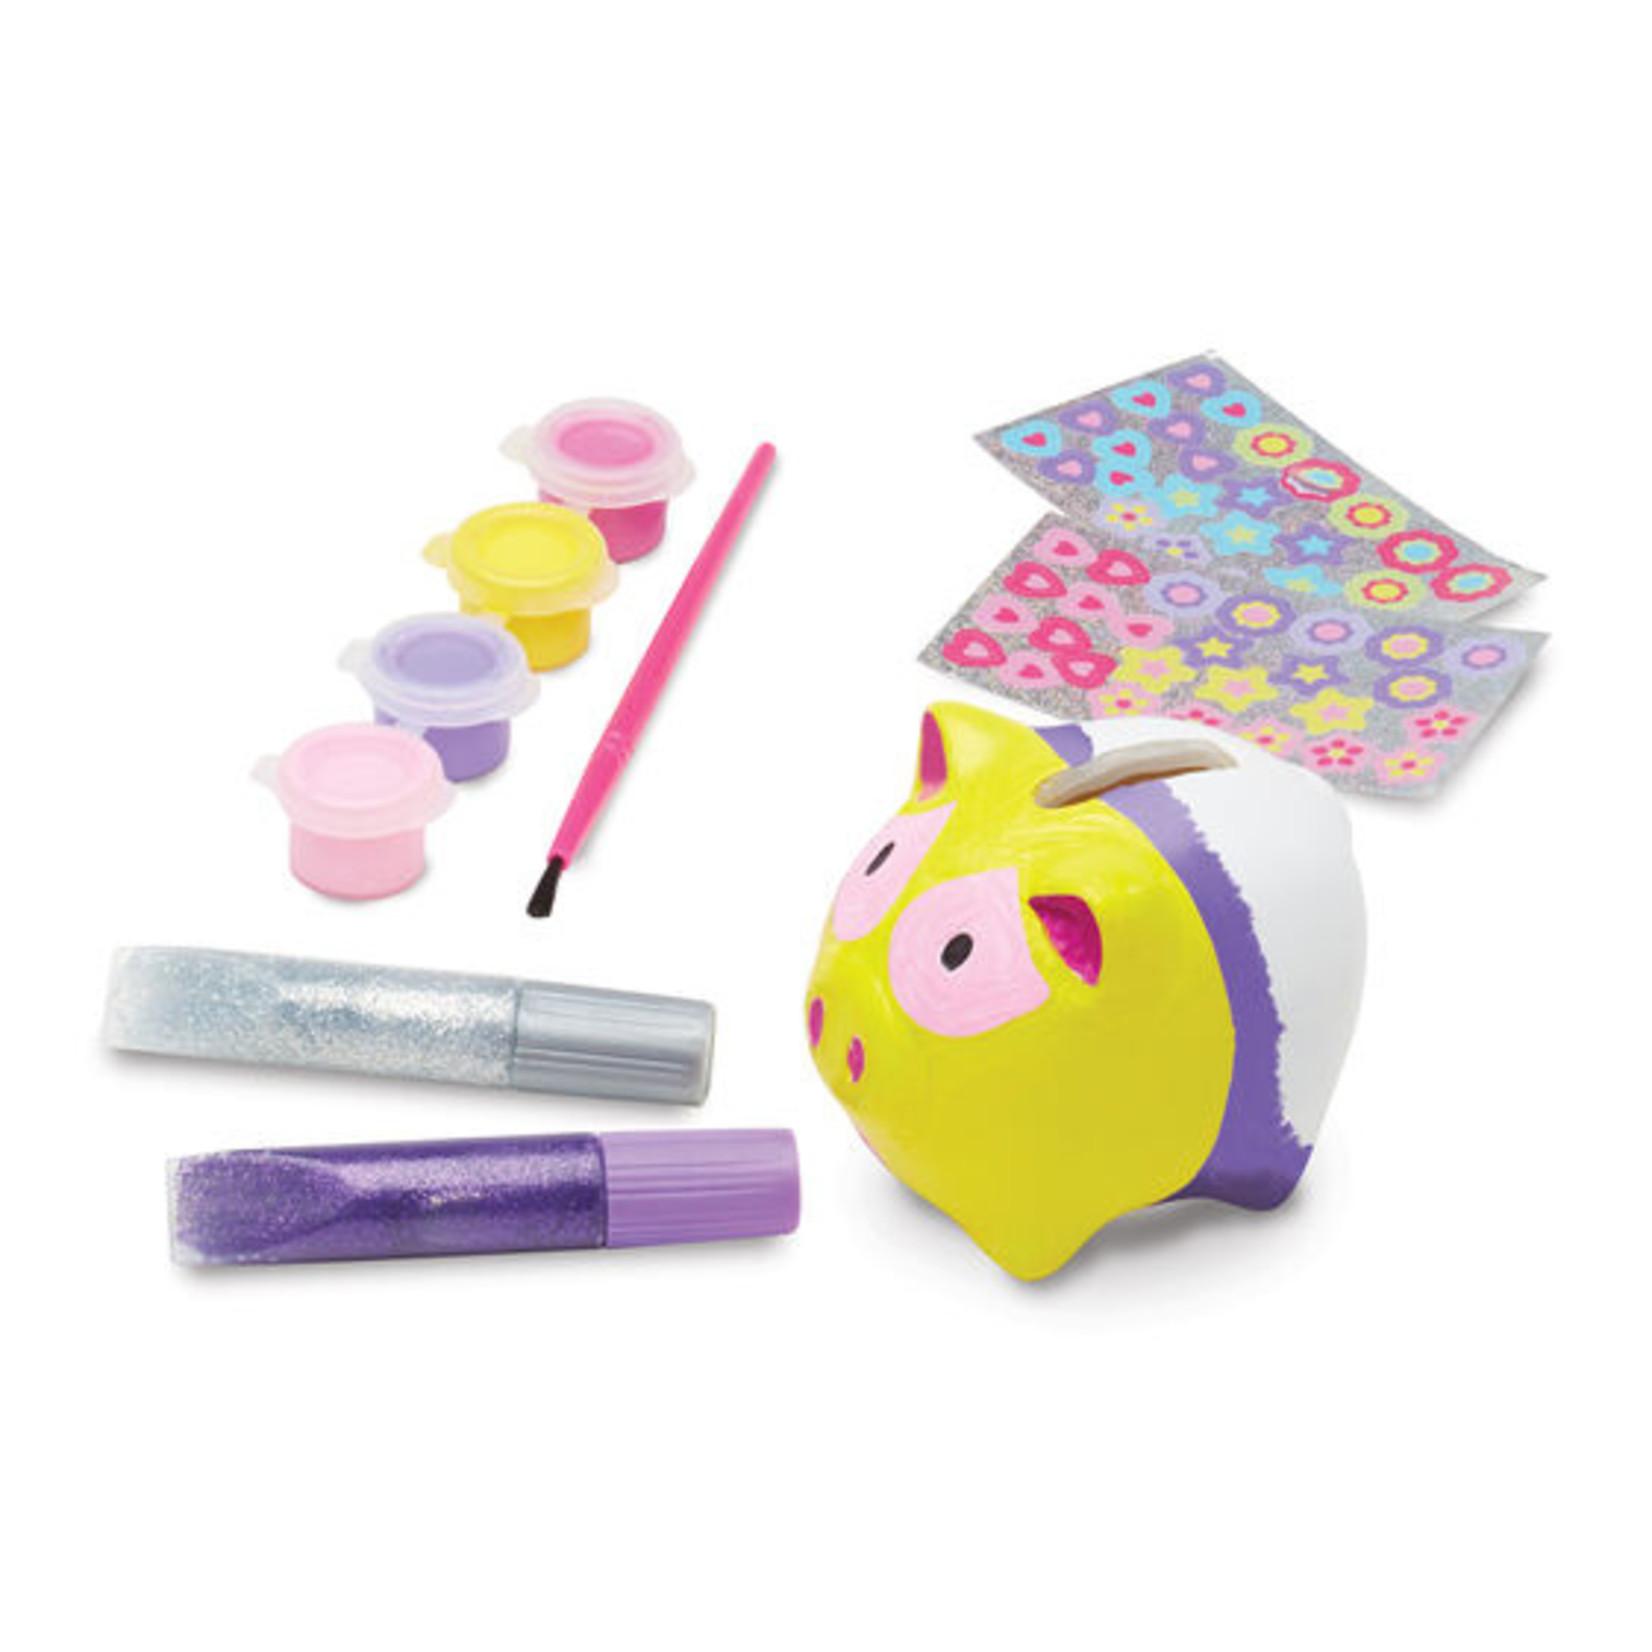 Melissa & Doug Created by Me! Piggy Bank Craft Kit